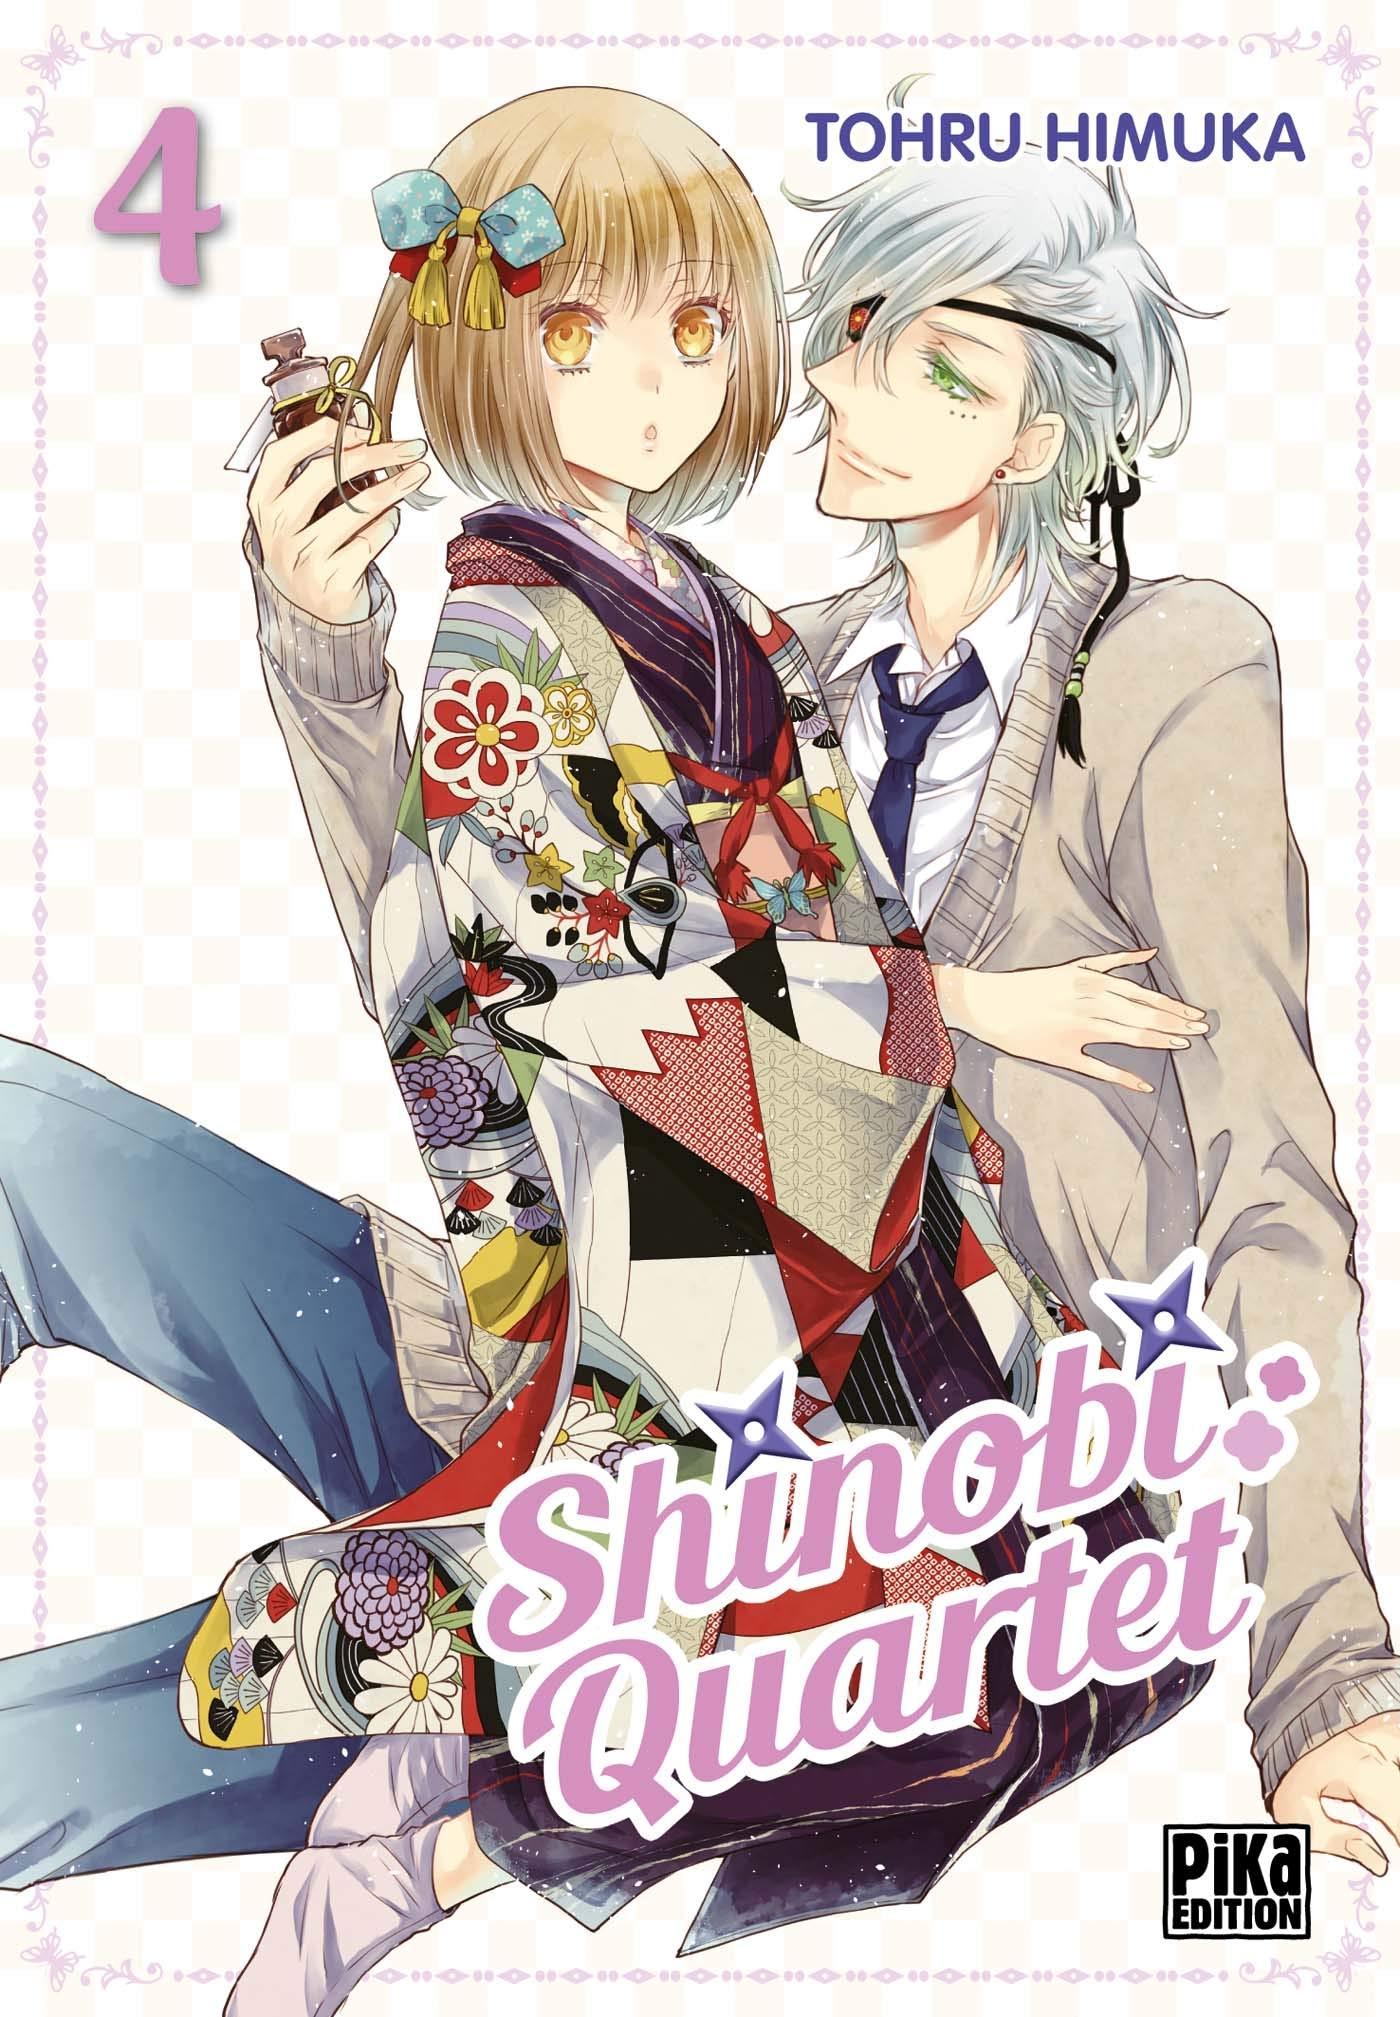 Shinobi Quartet 4